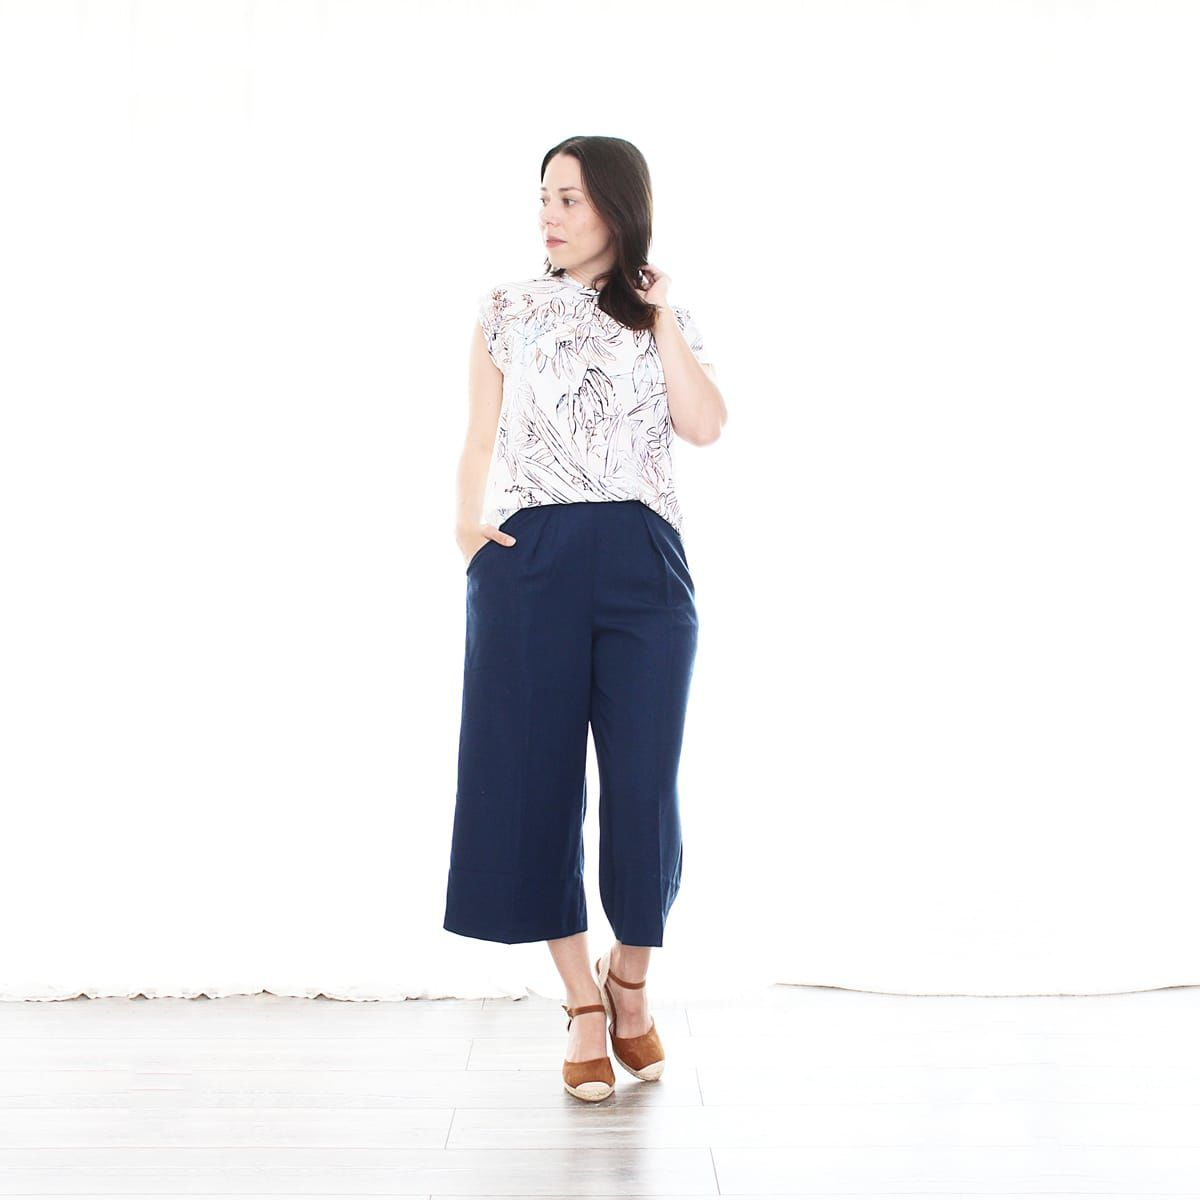 sommer-outfit_culotte_blumen-shirt_blau_wedges_keil-pumps_fashion_style_zalando2q-min